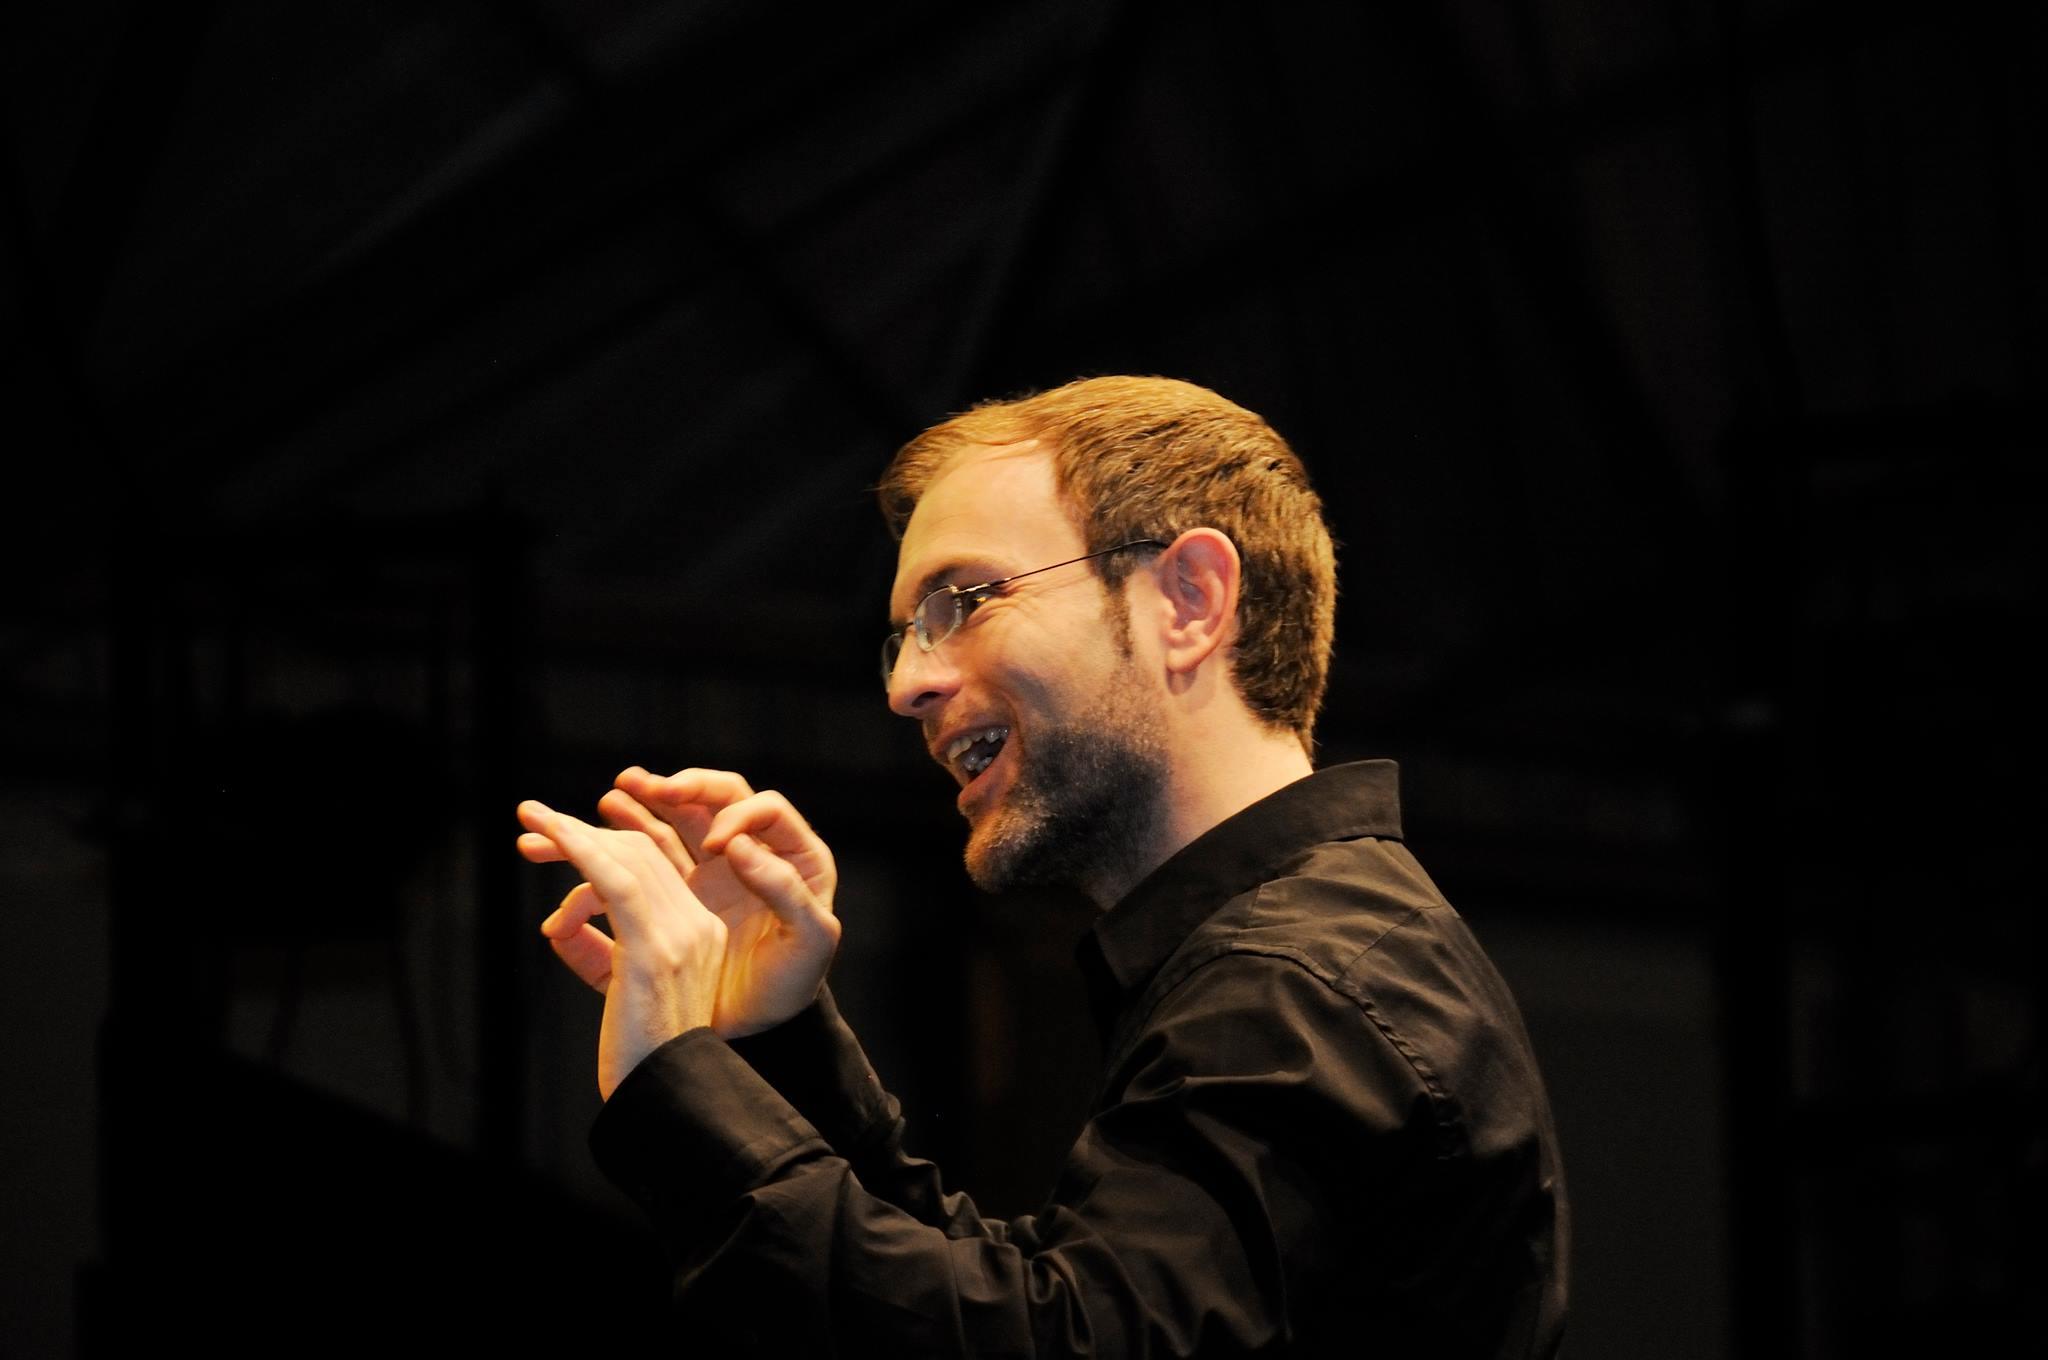 DIRECTOR CORAL RAUL BARRIO